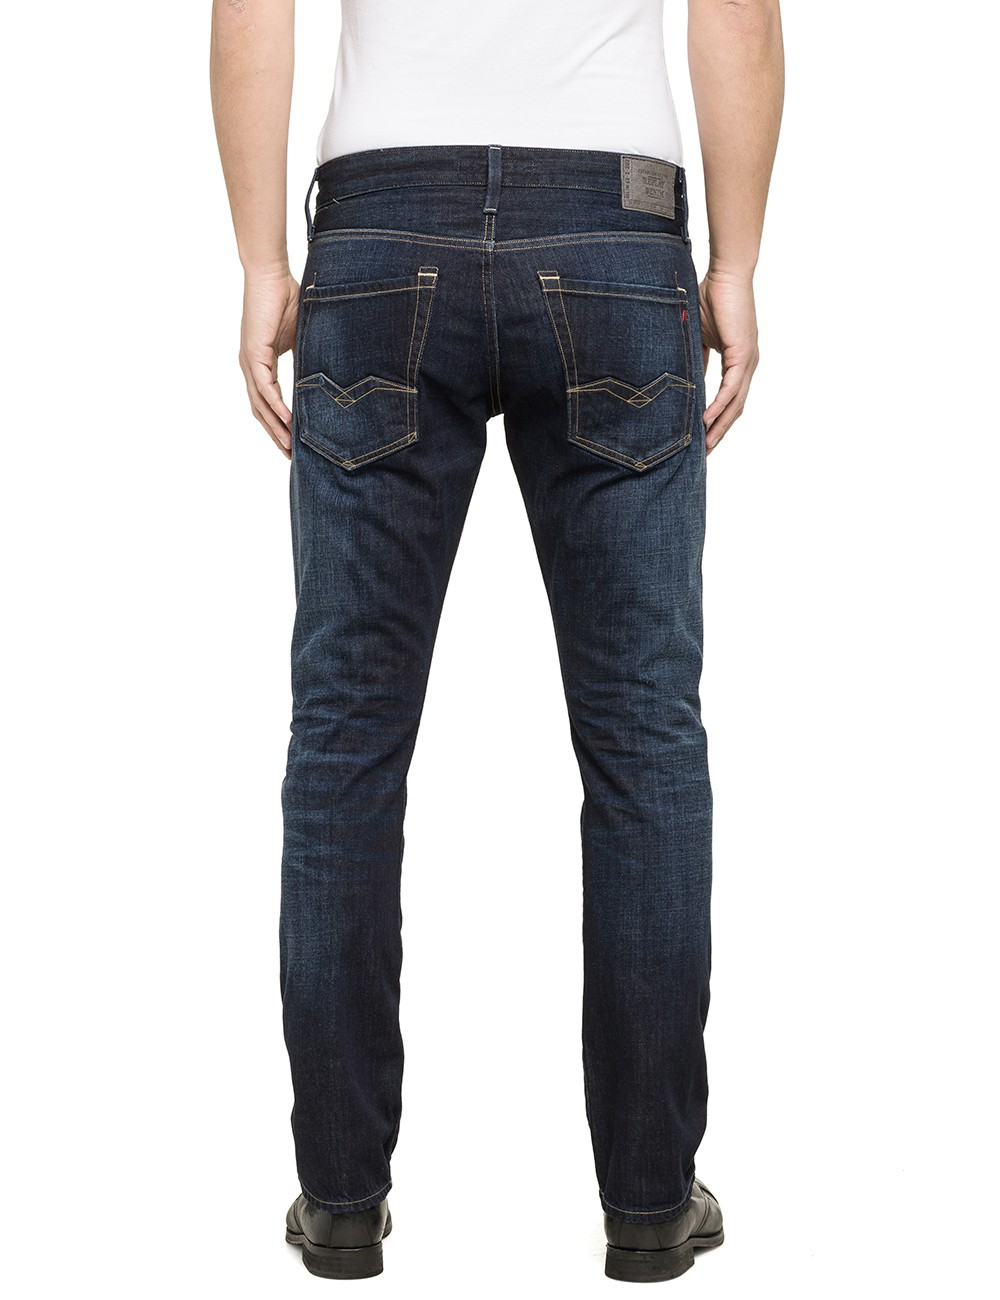 replay herren jeans waitom regular fit deep blue kaufen jeans direct de. Black Bedroom Furniture Sets. Home Design Ideas